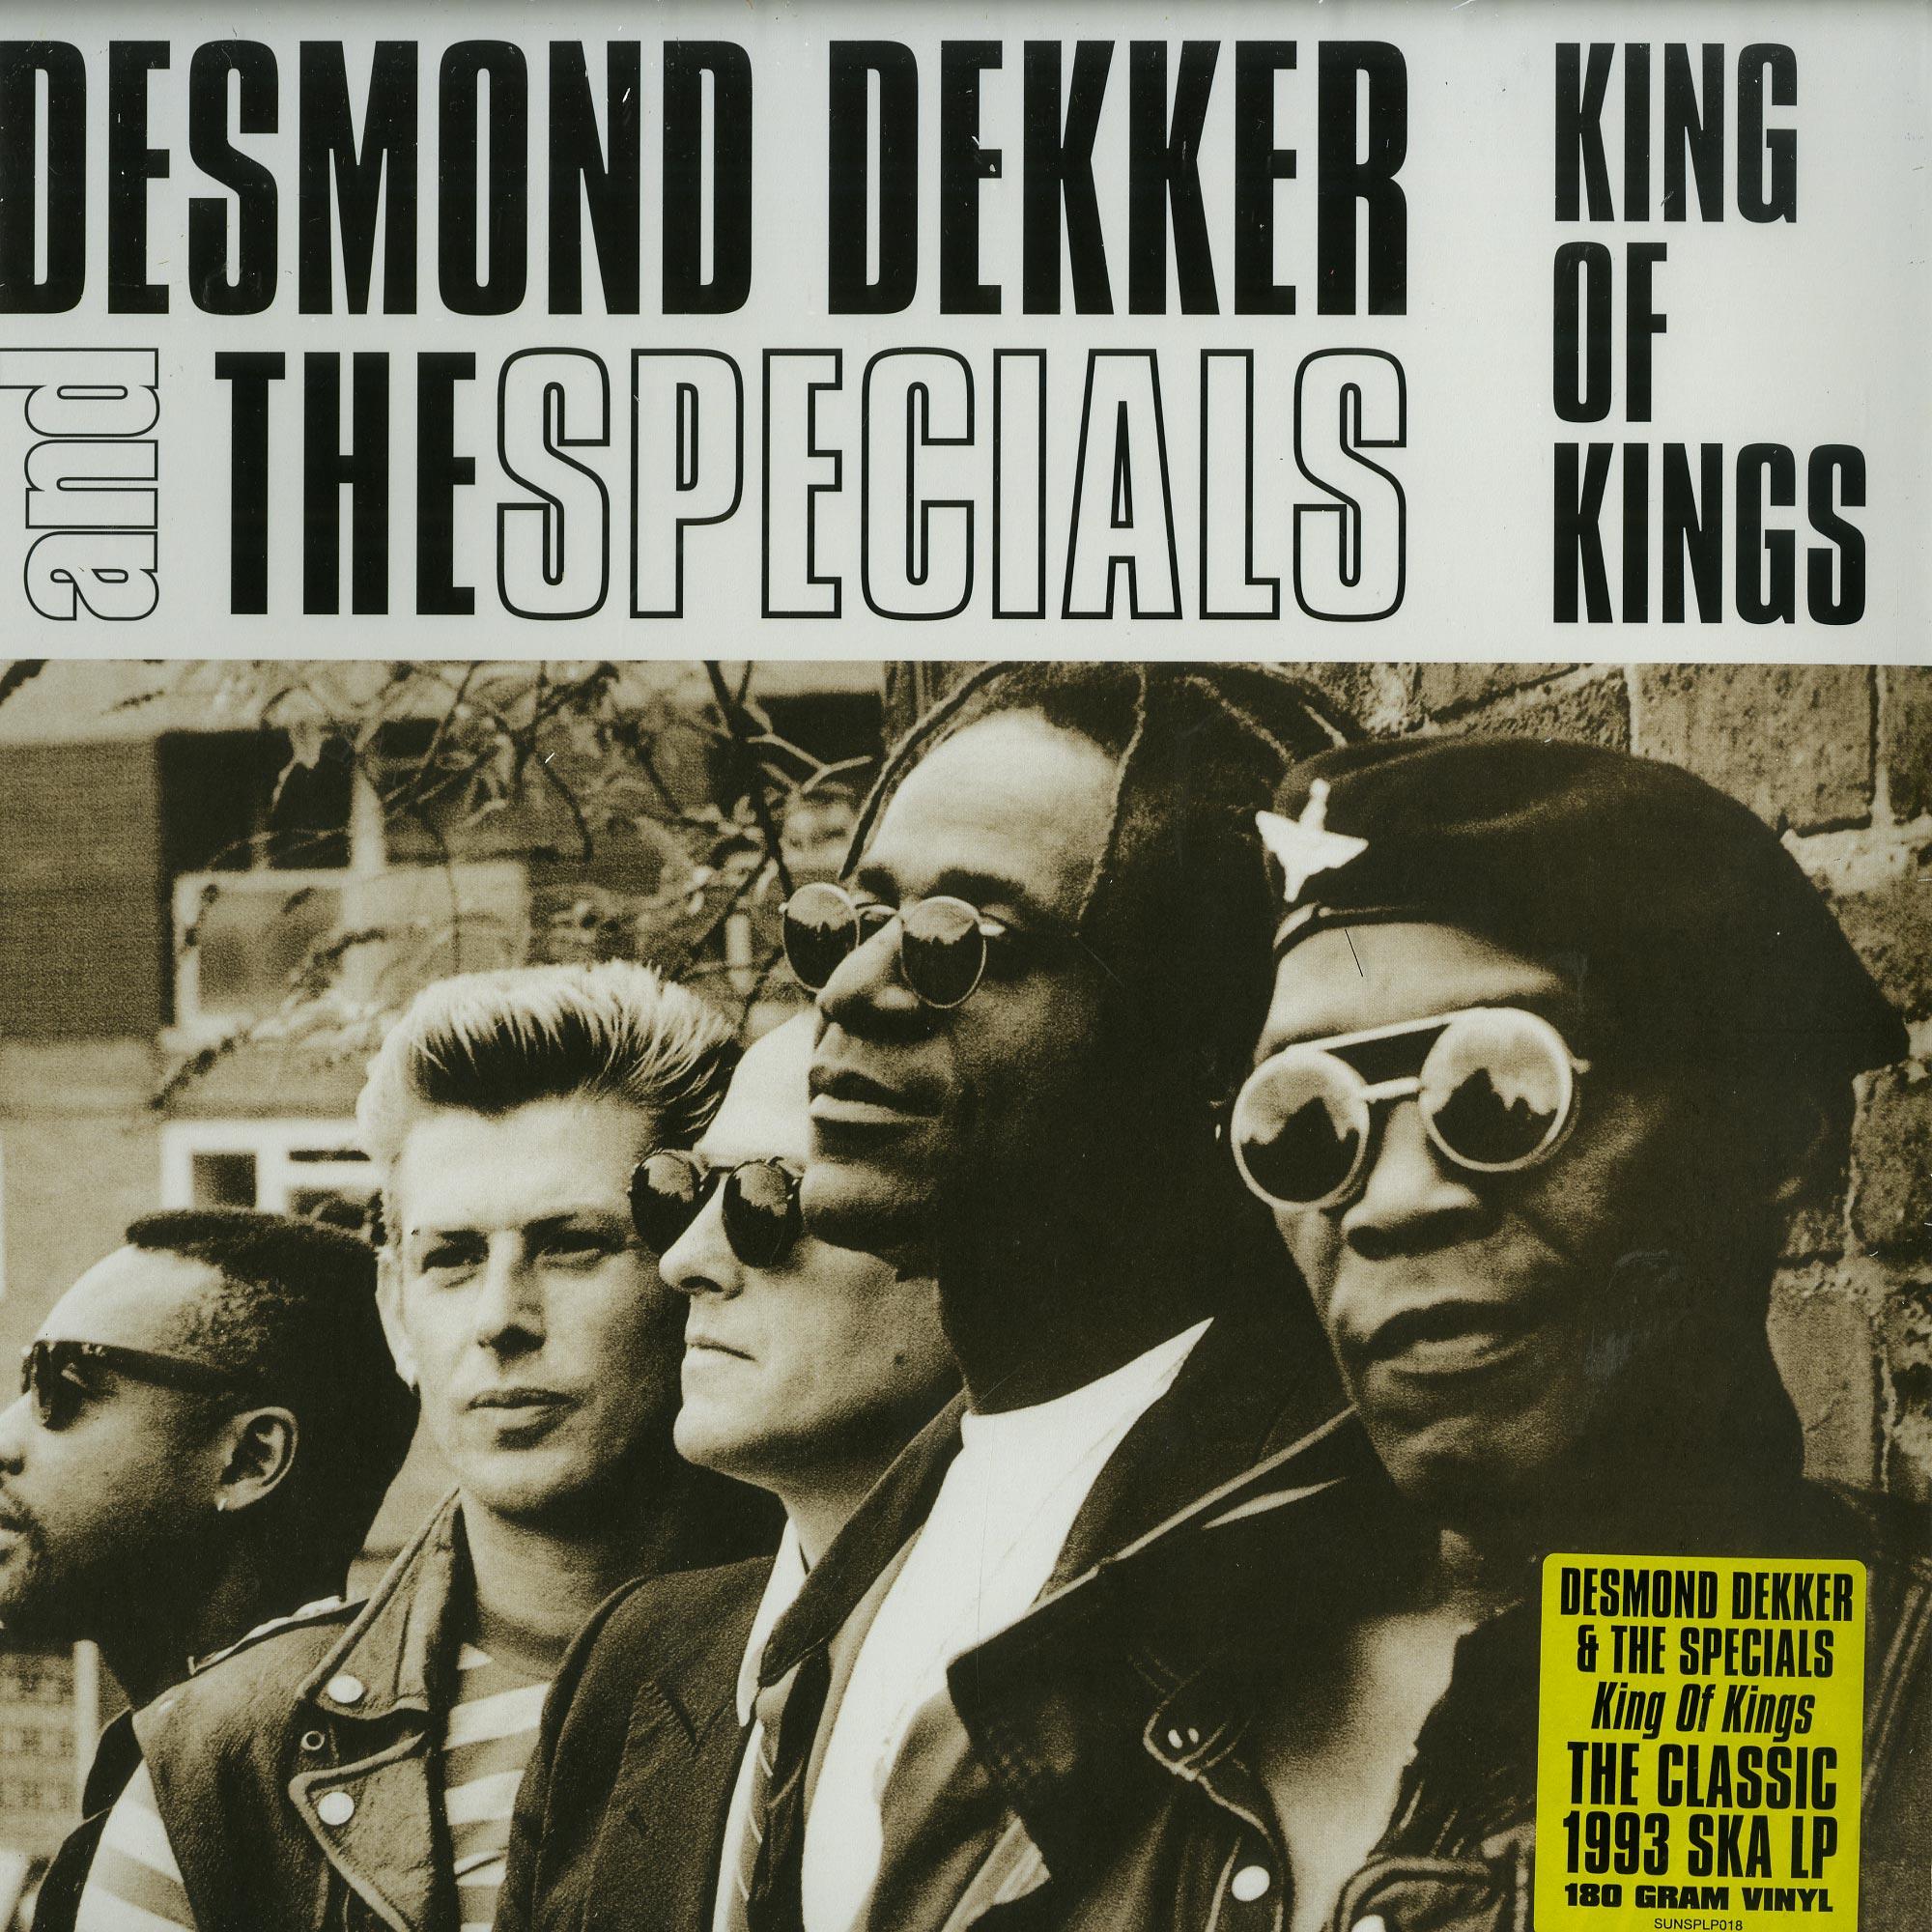 Desmond Dekker & The Specials - KING OF KINGS